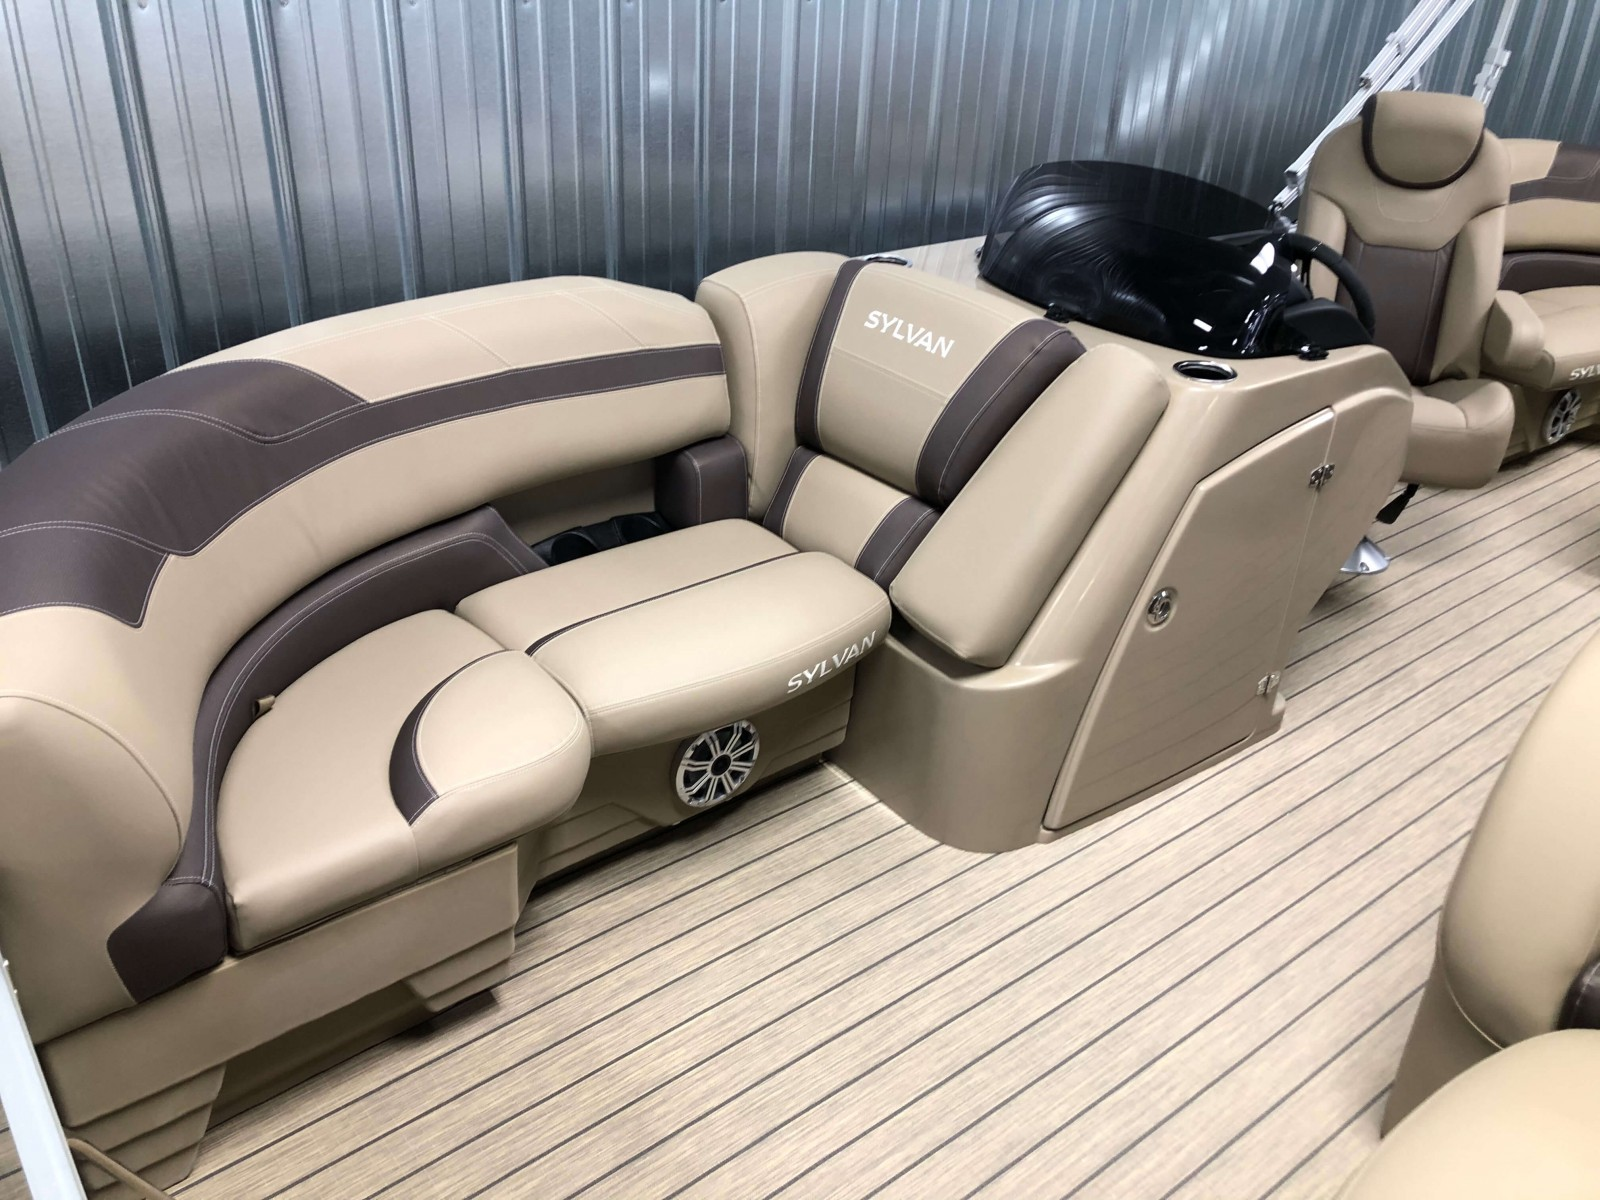 Interior Seating of the 2021 Sylvan L1 LZ Pontoon Boat